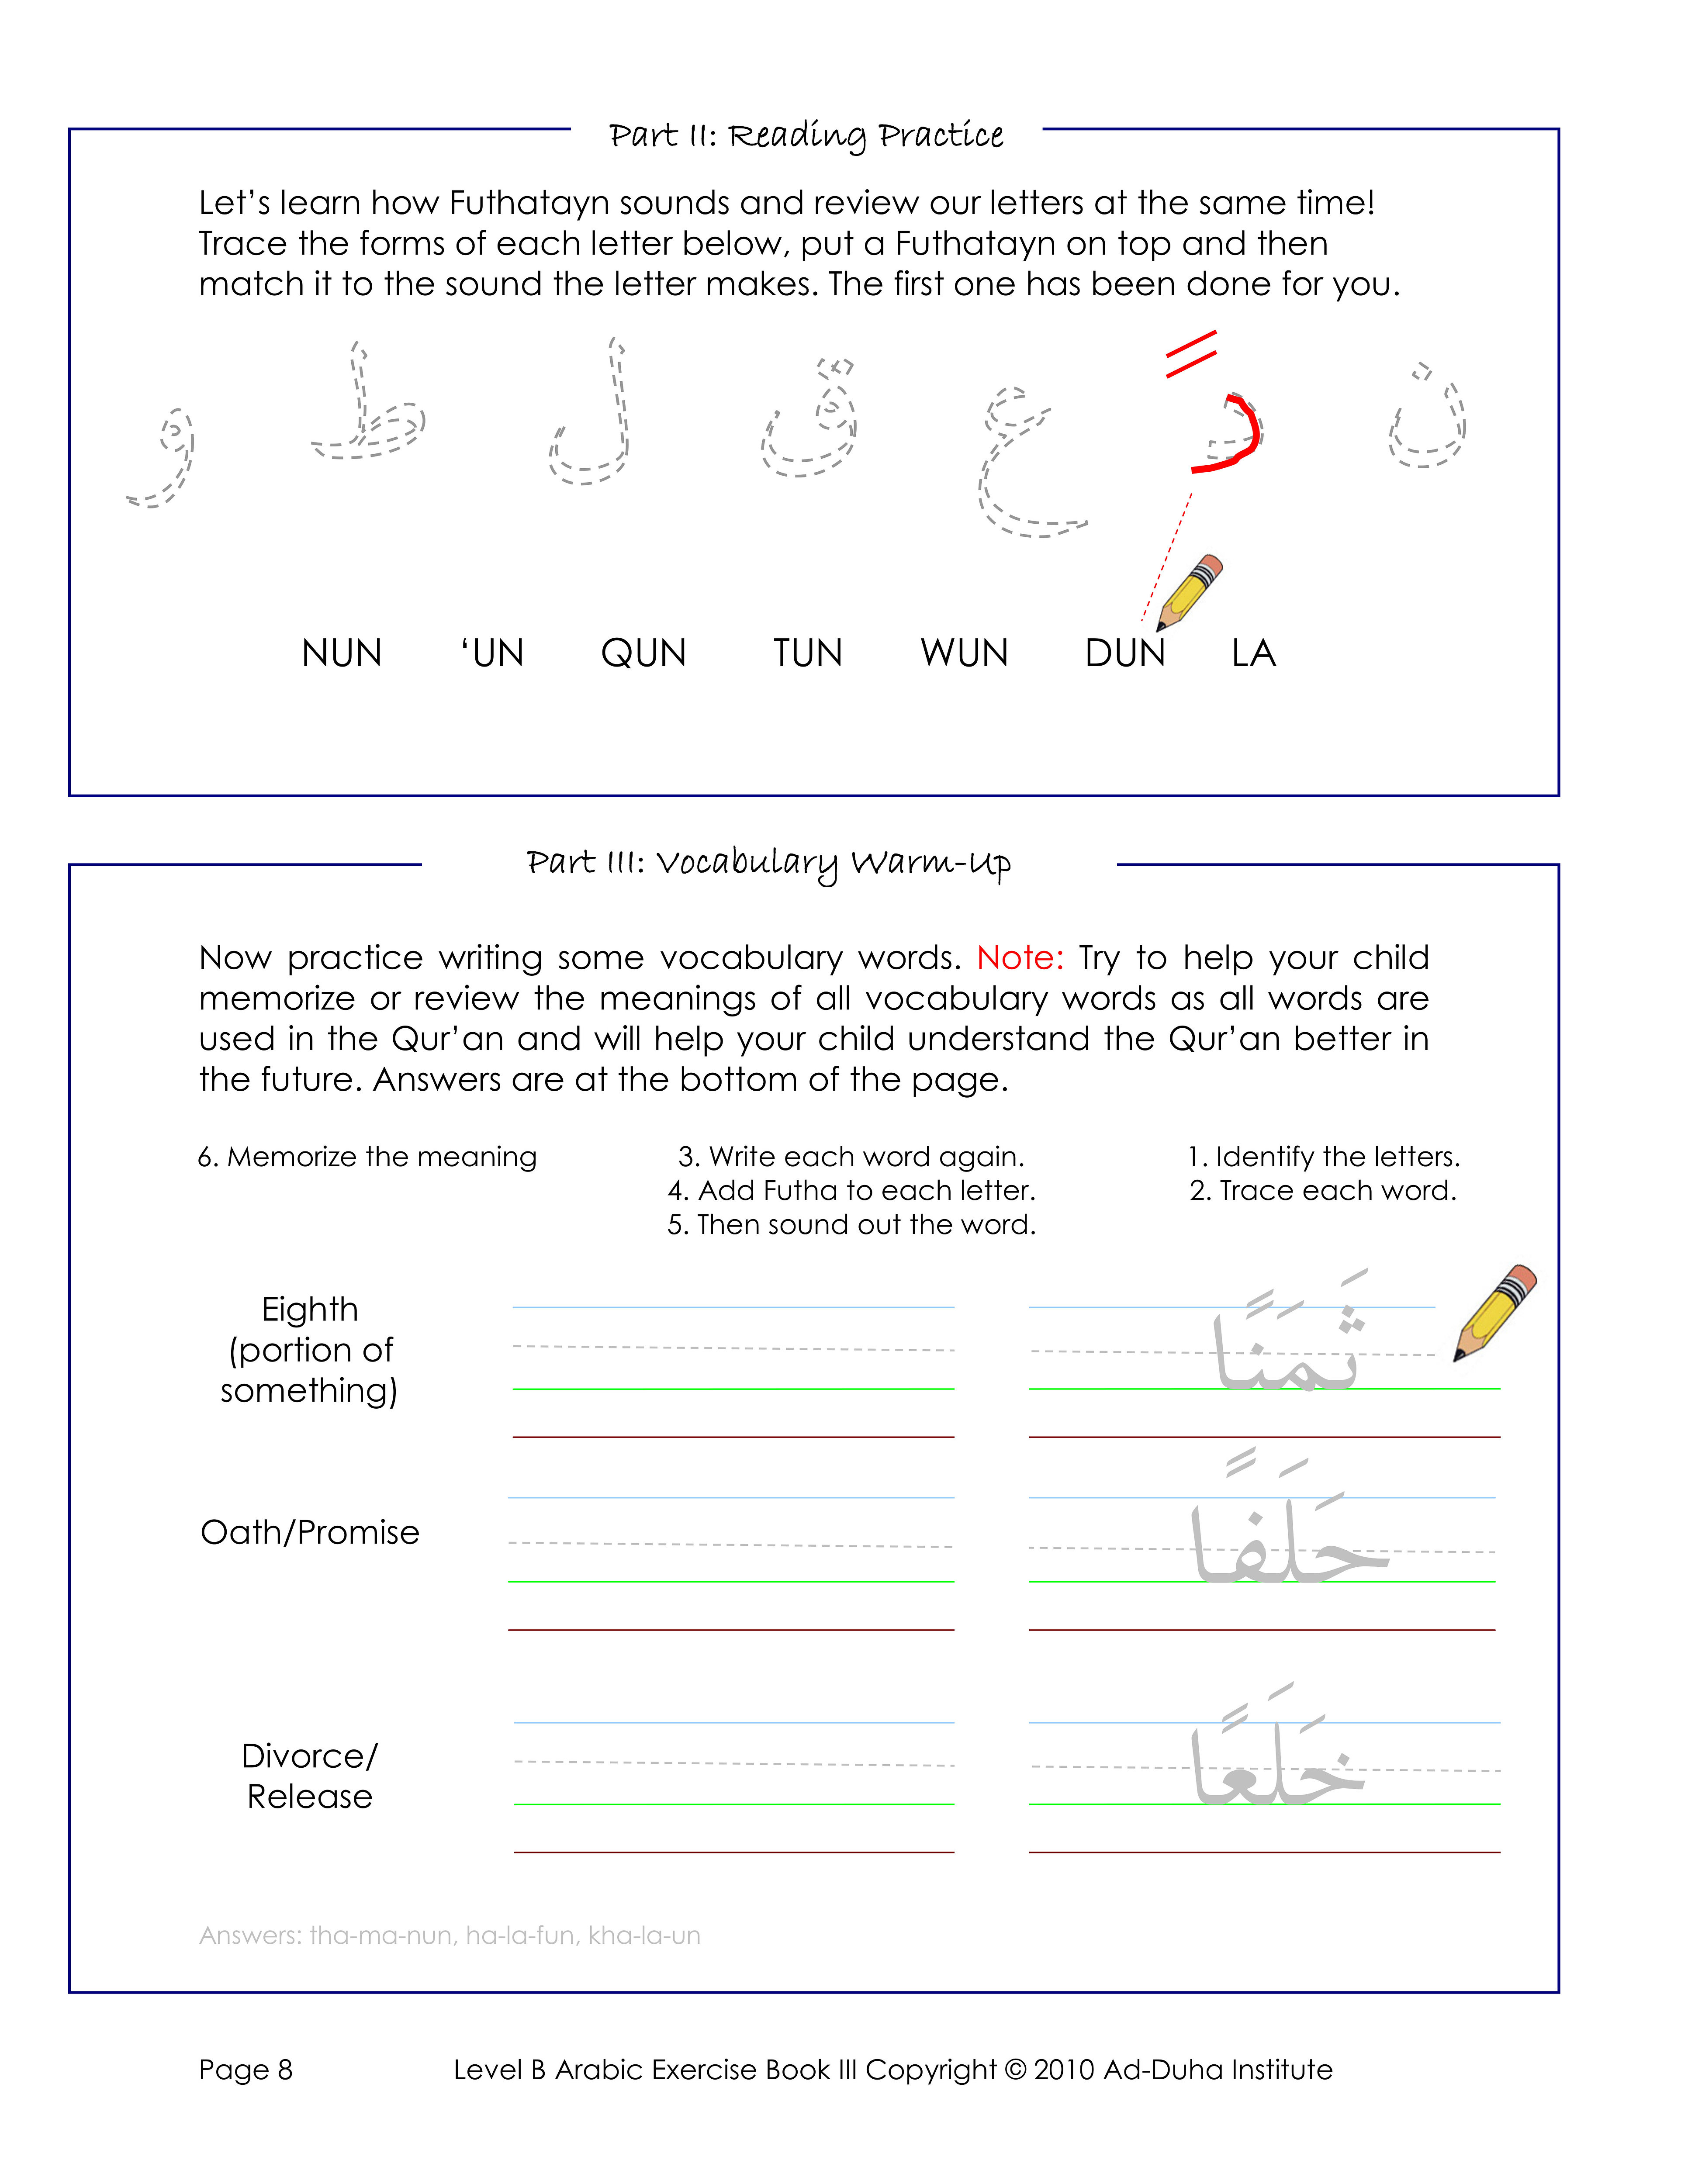 Level B Islamic Studies & Arabic Course: 1st-2nd Grade